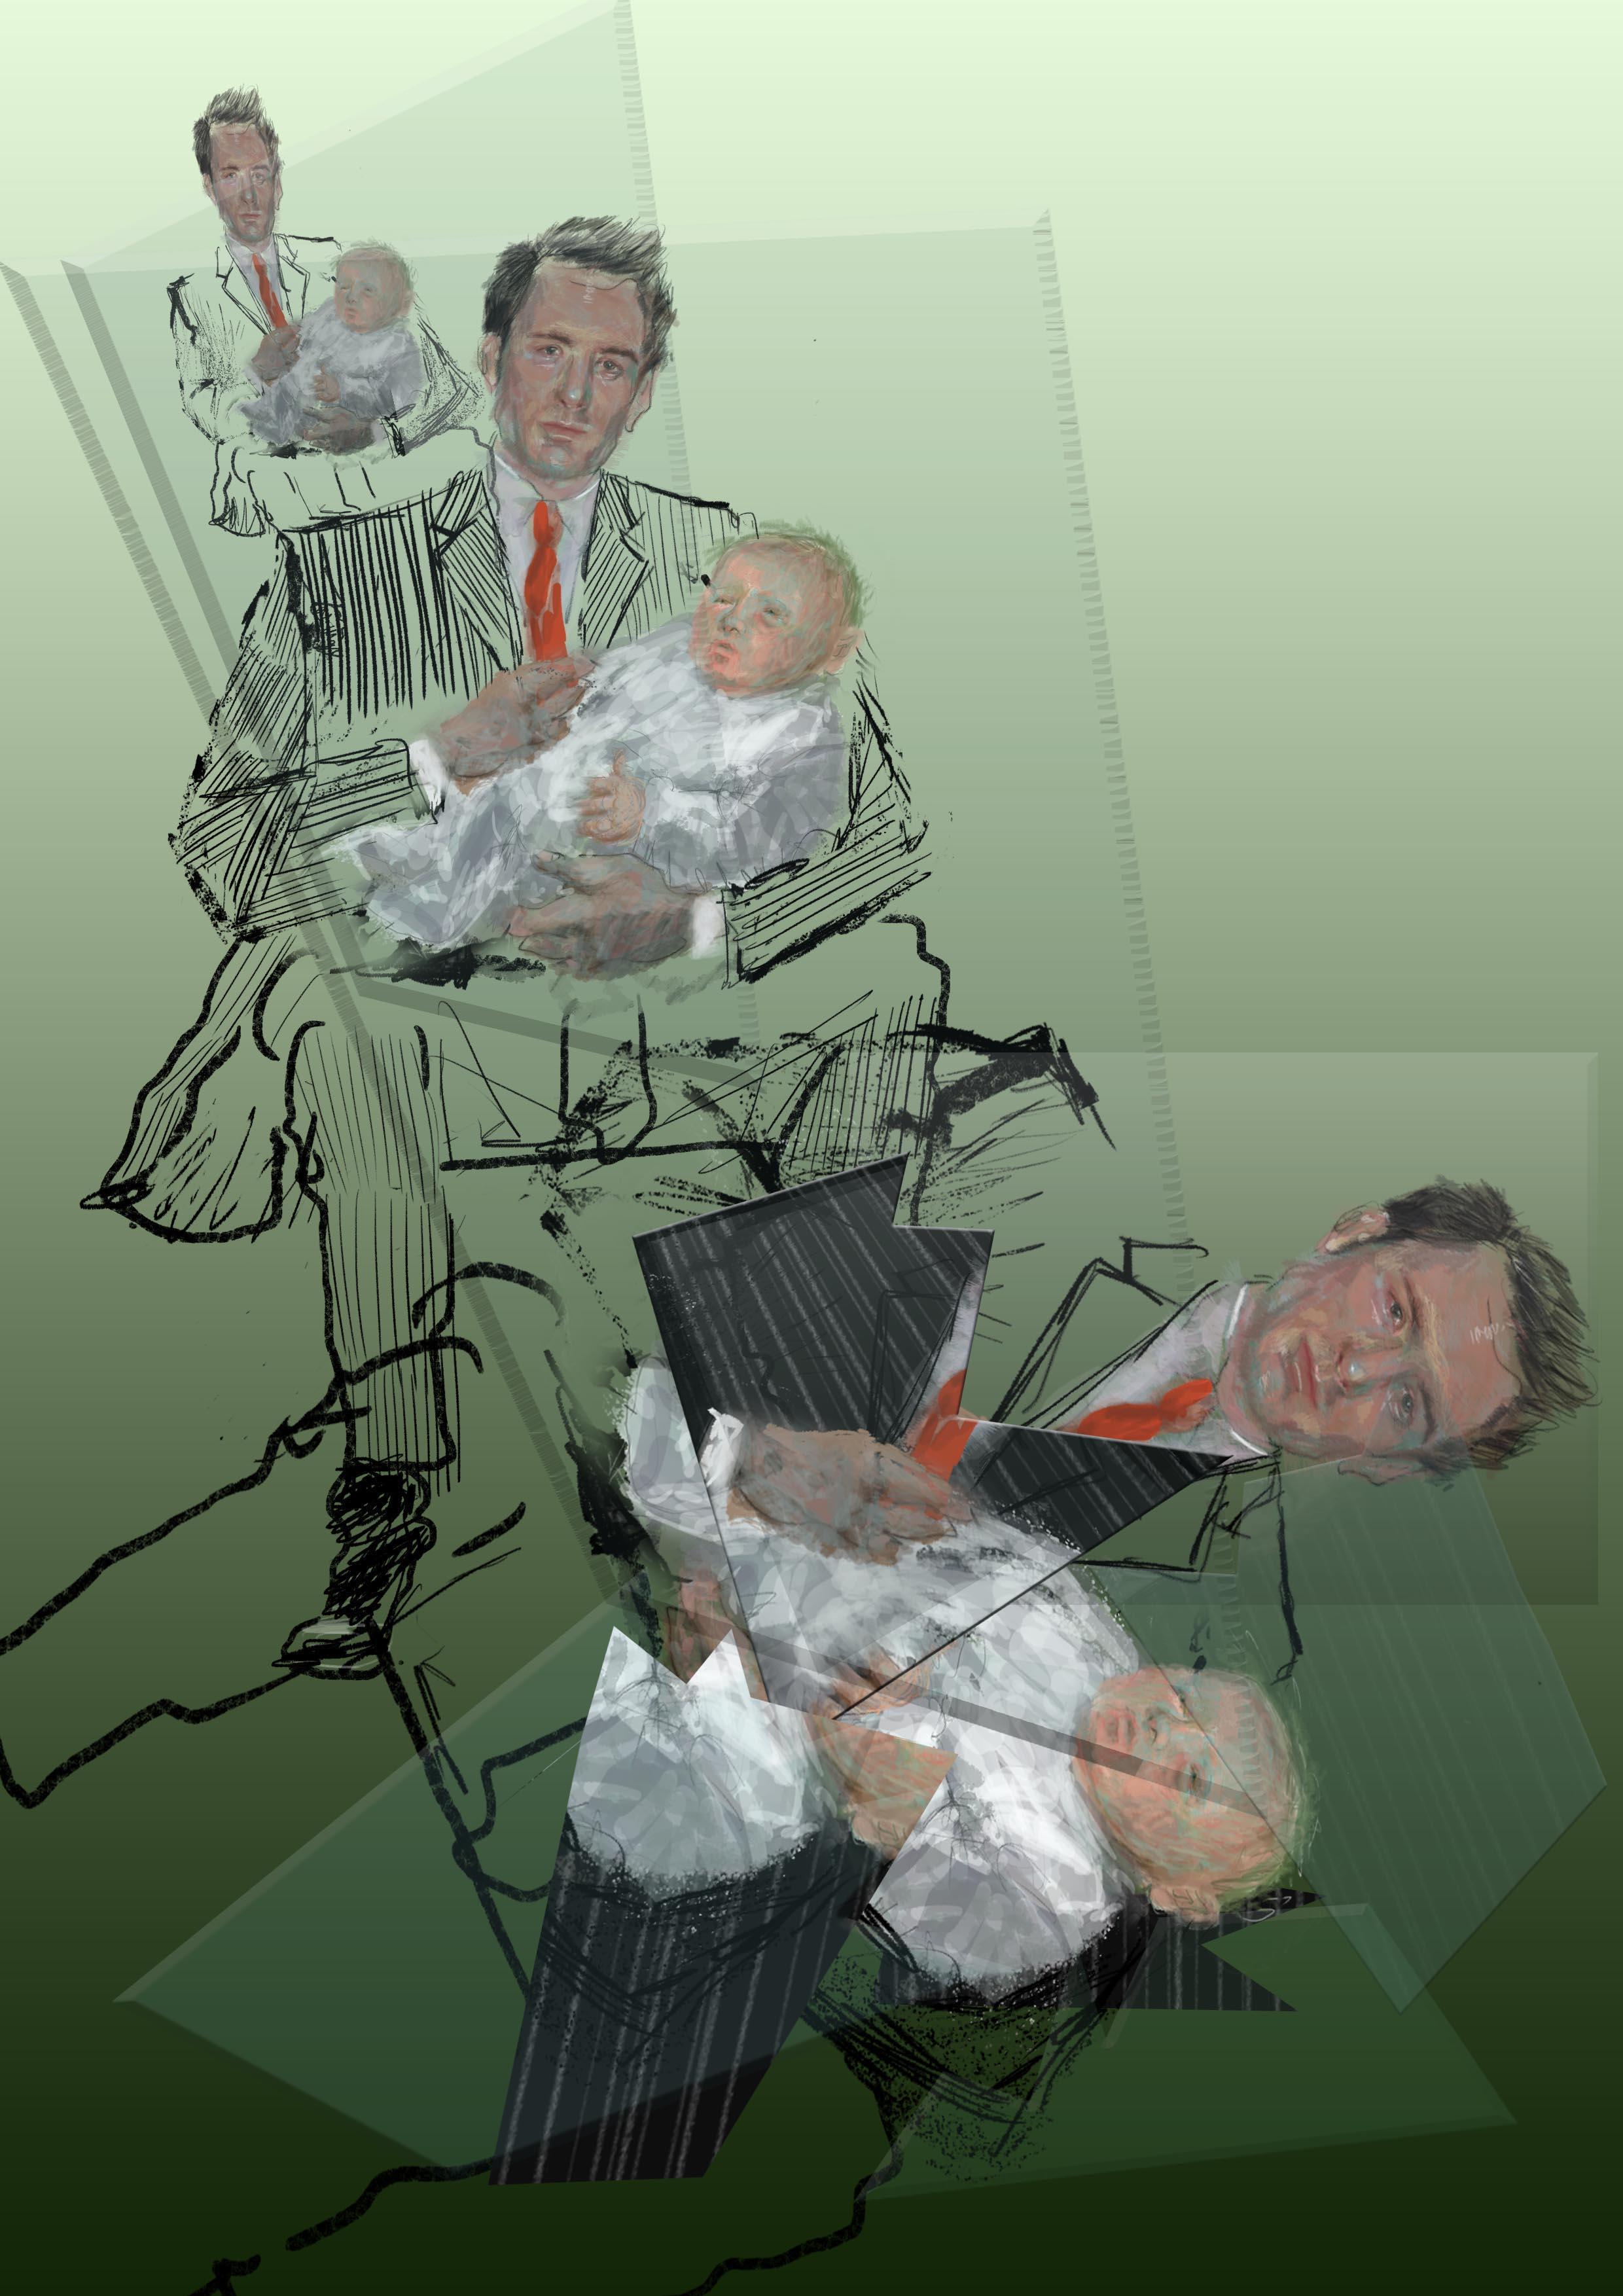 Gillian Holding Family Man 2009 Digital print on aluminium 30cm x 20cm ed.10 £30